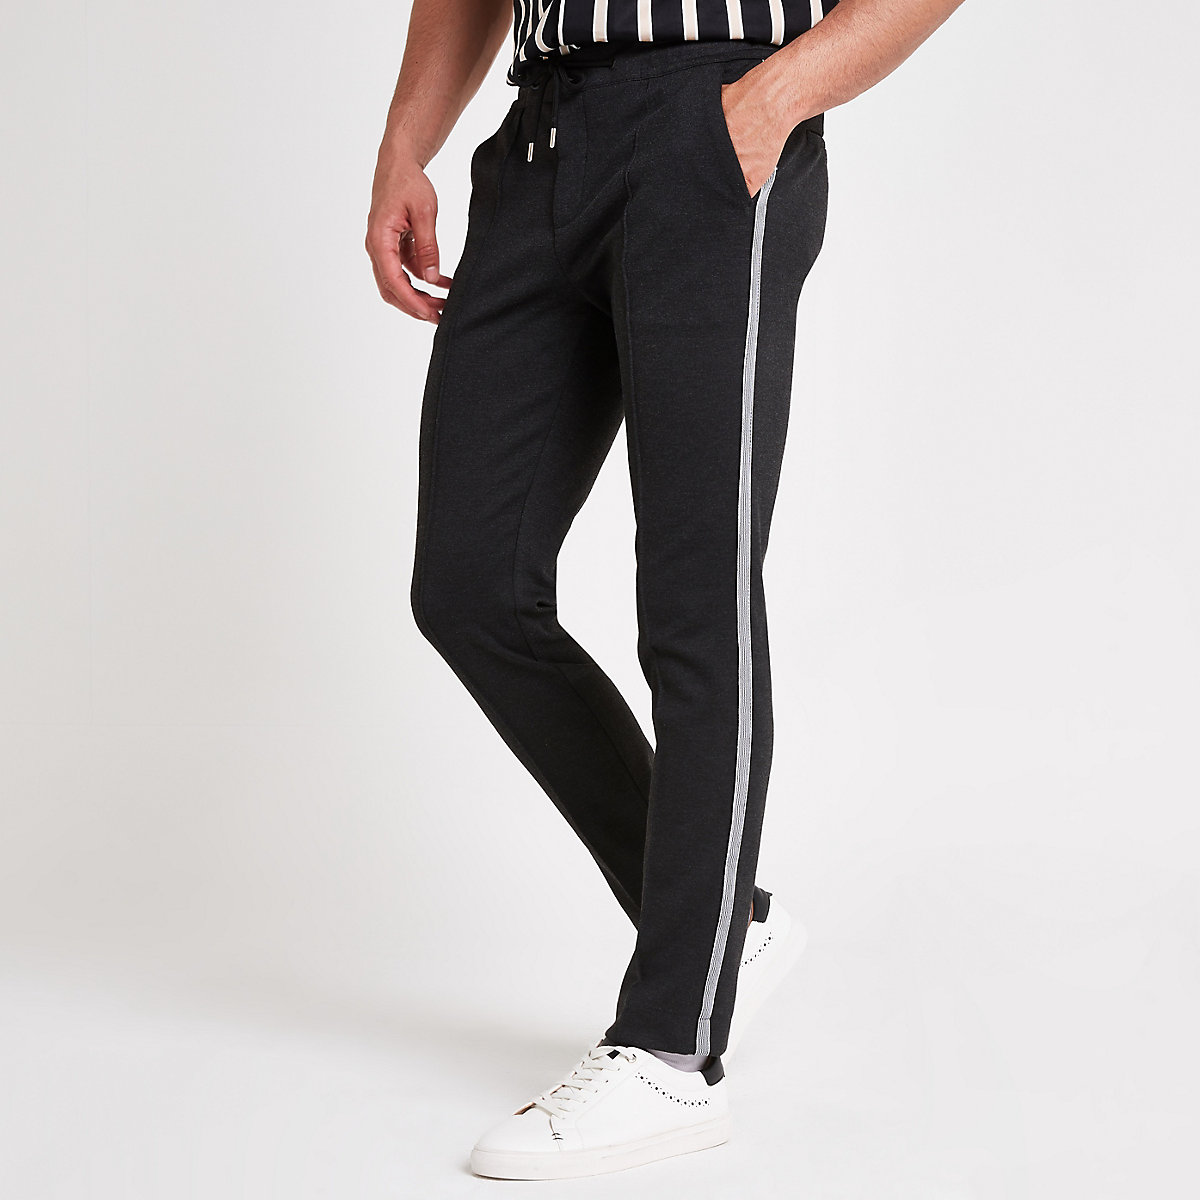 Dark grey stretch skinny jogger pants